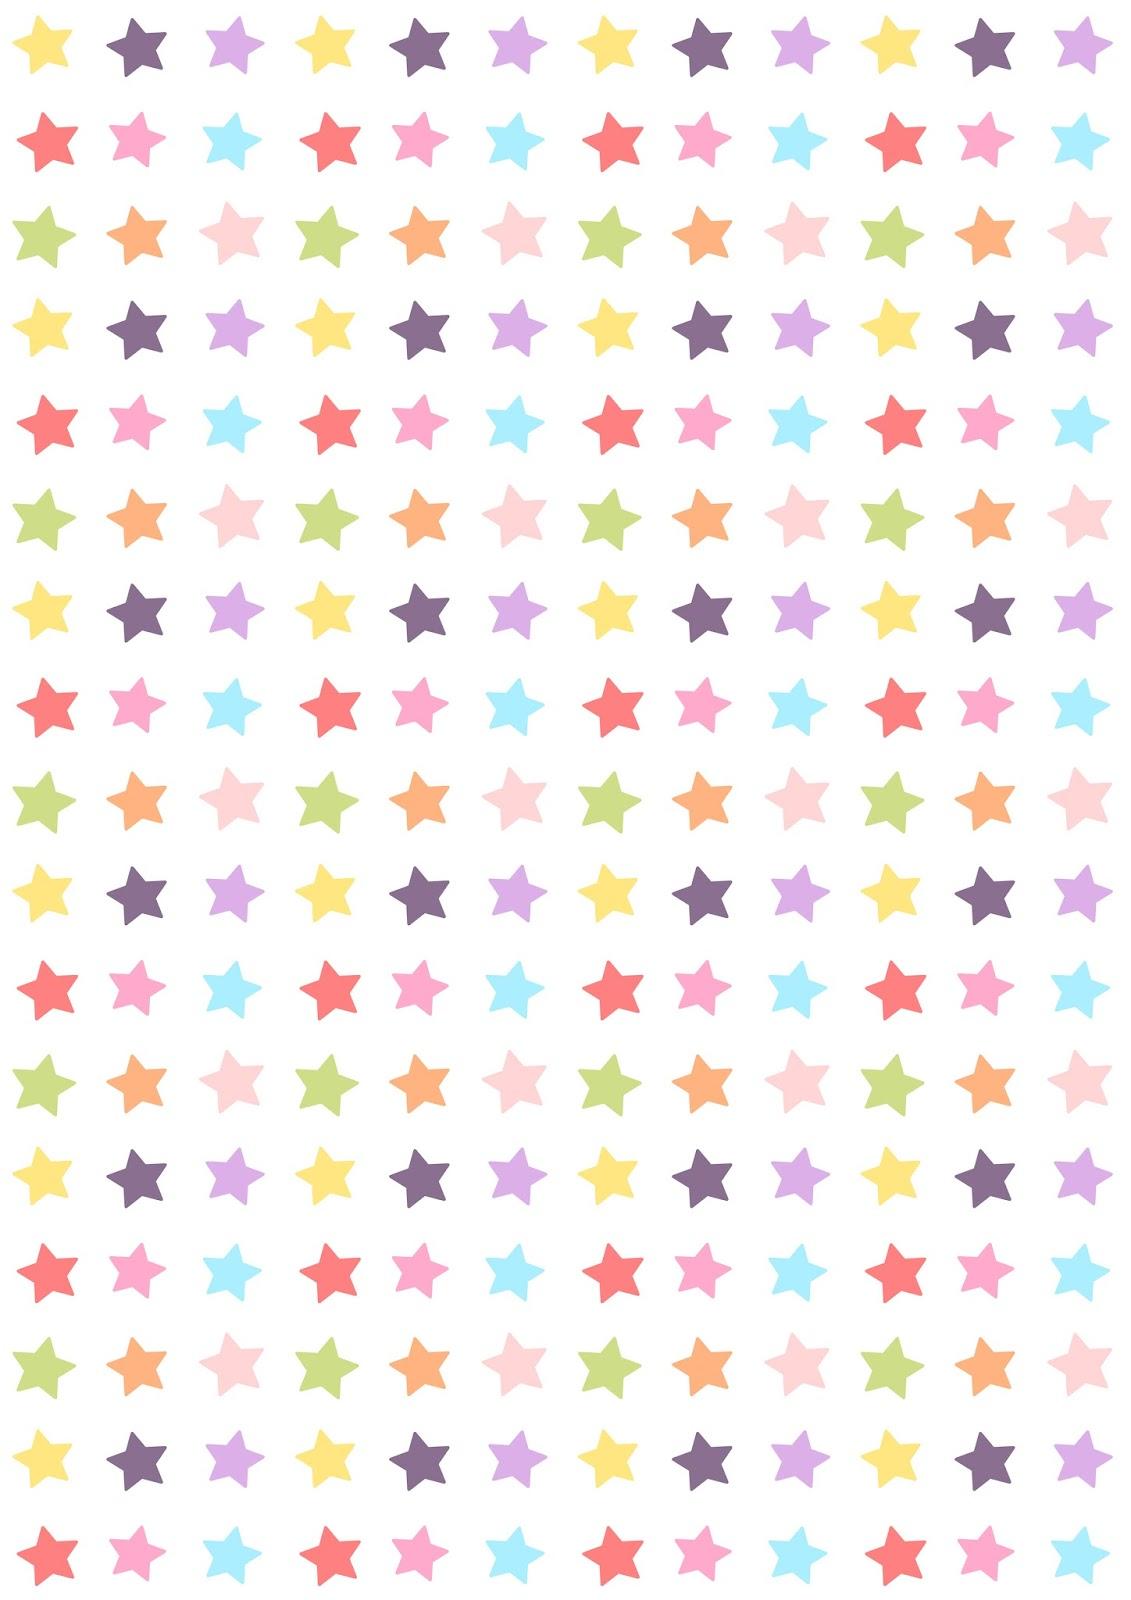 Free digital star candy scrapbooking paper - ausdruckbares ... - photo#45